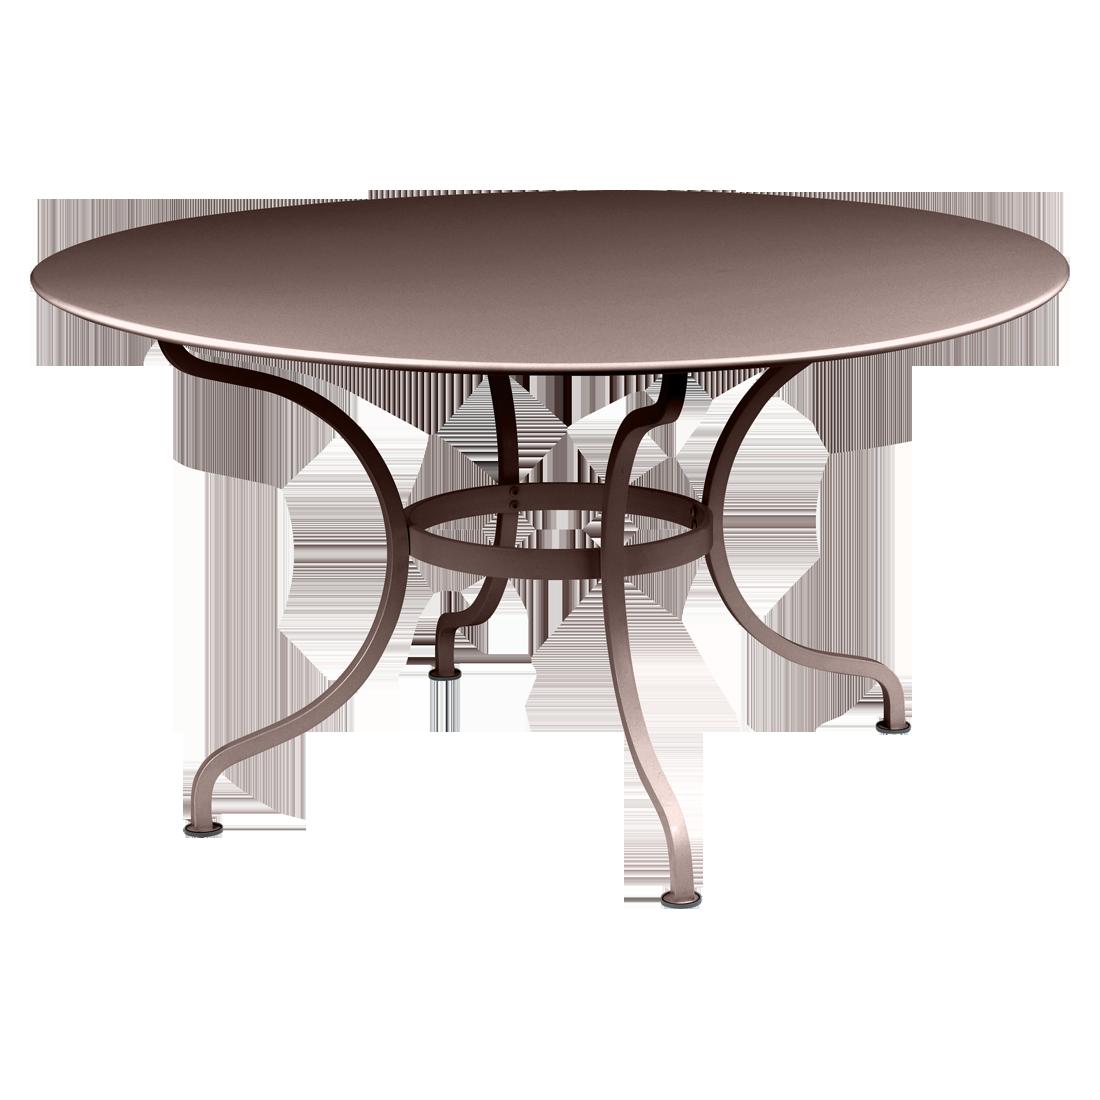 table ronde 137 cm romane table de jardin mobilier de jardin. Black Bedroom Furniture Sets. Home Design Ideas